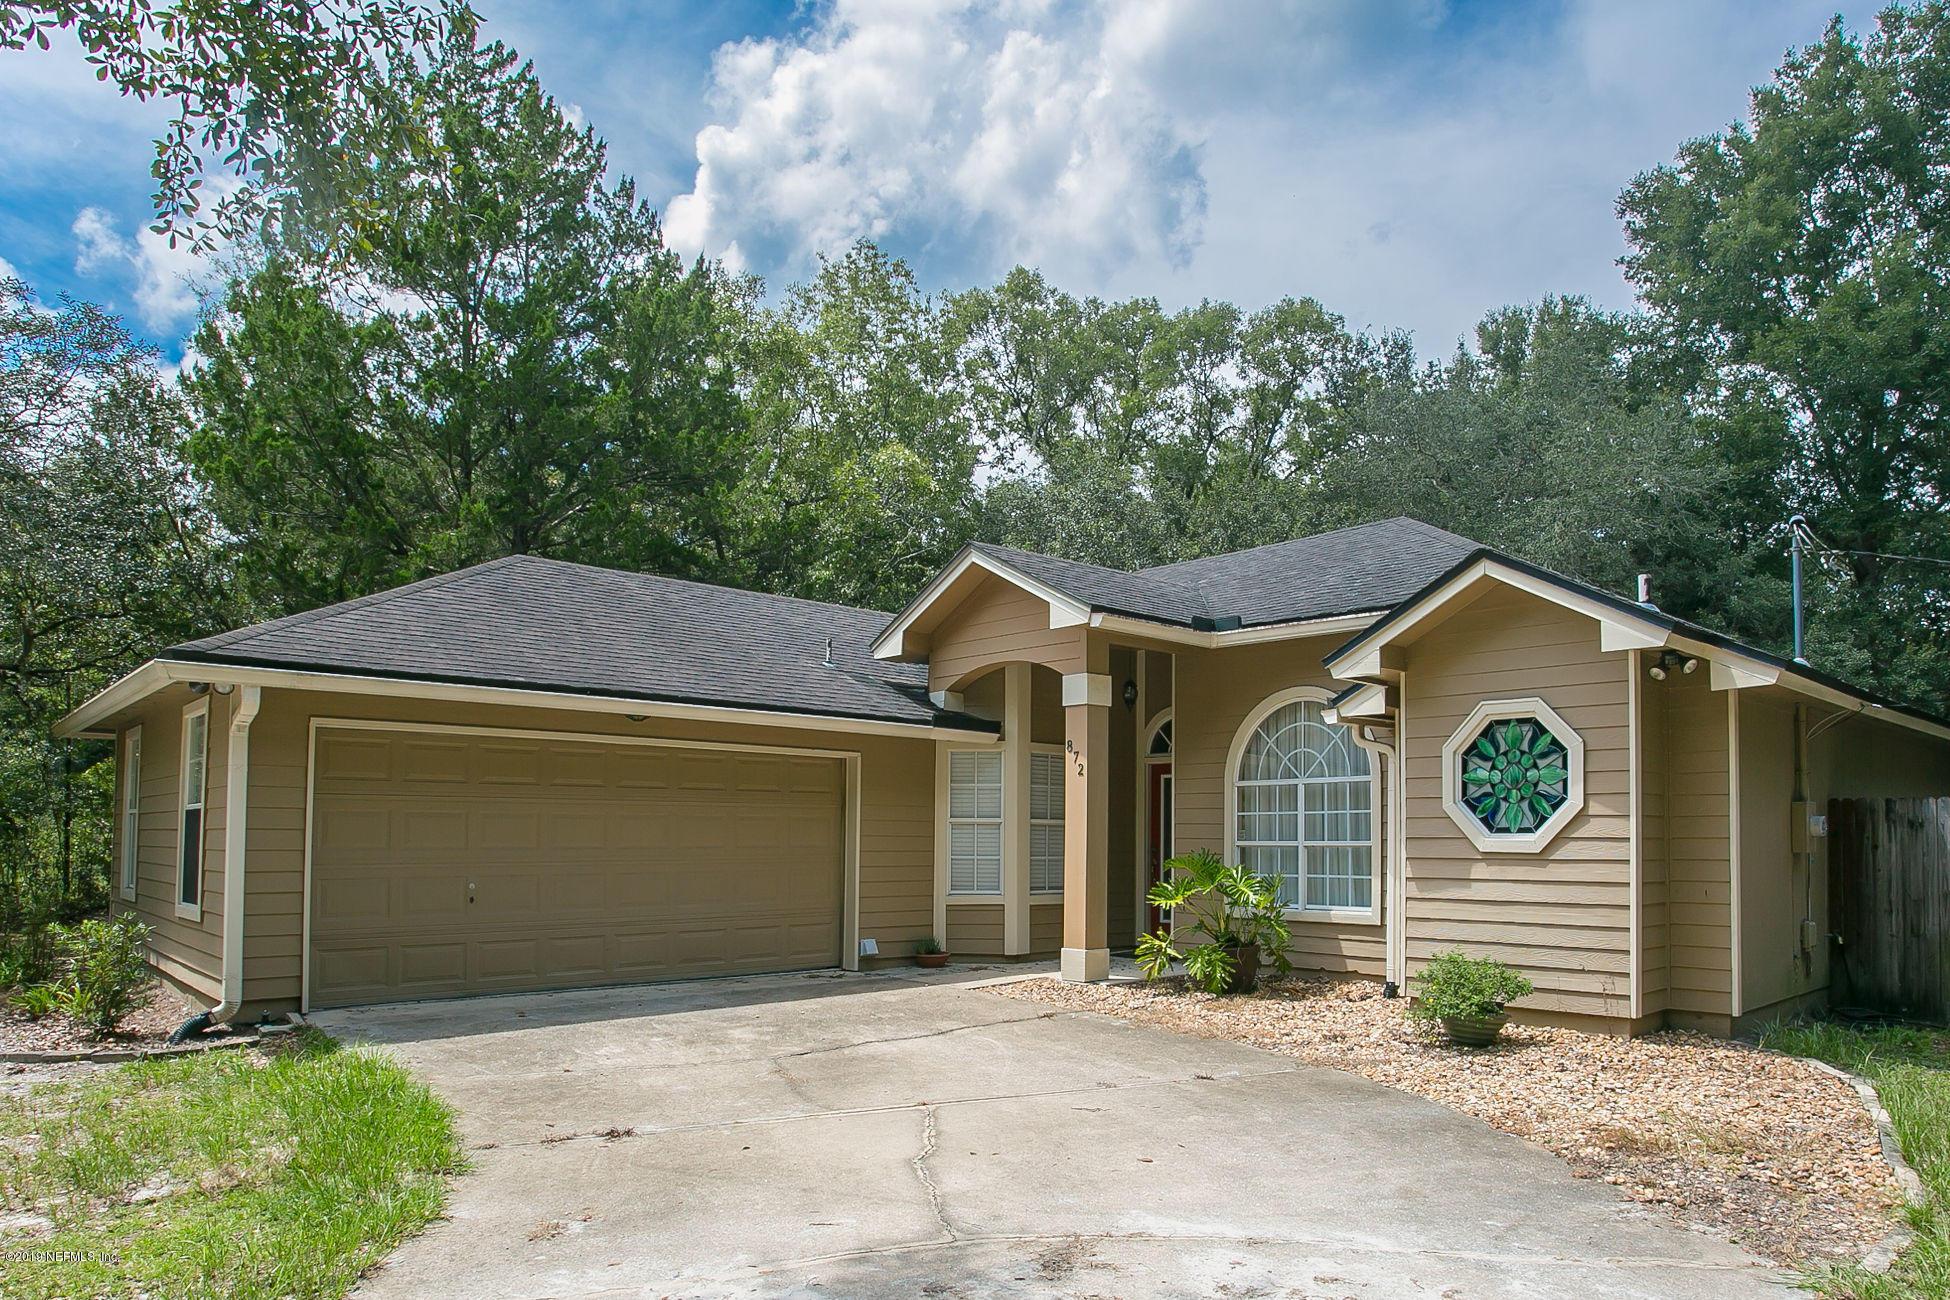 872 HAYNES, GREEN COVE SPRINGS, FLORIDA 32043, 4 Bedrooms Bedrooms, ,2 BathroomsBathrooms,Residential - single family,For sale,HAYNES,1014740